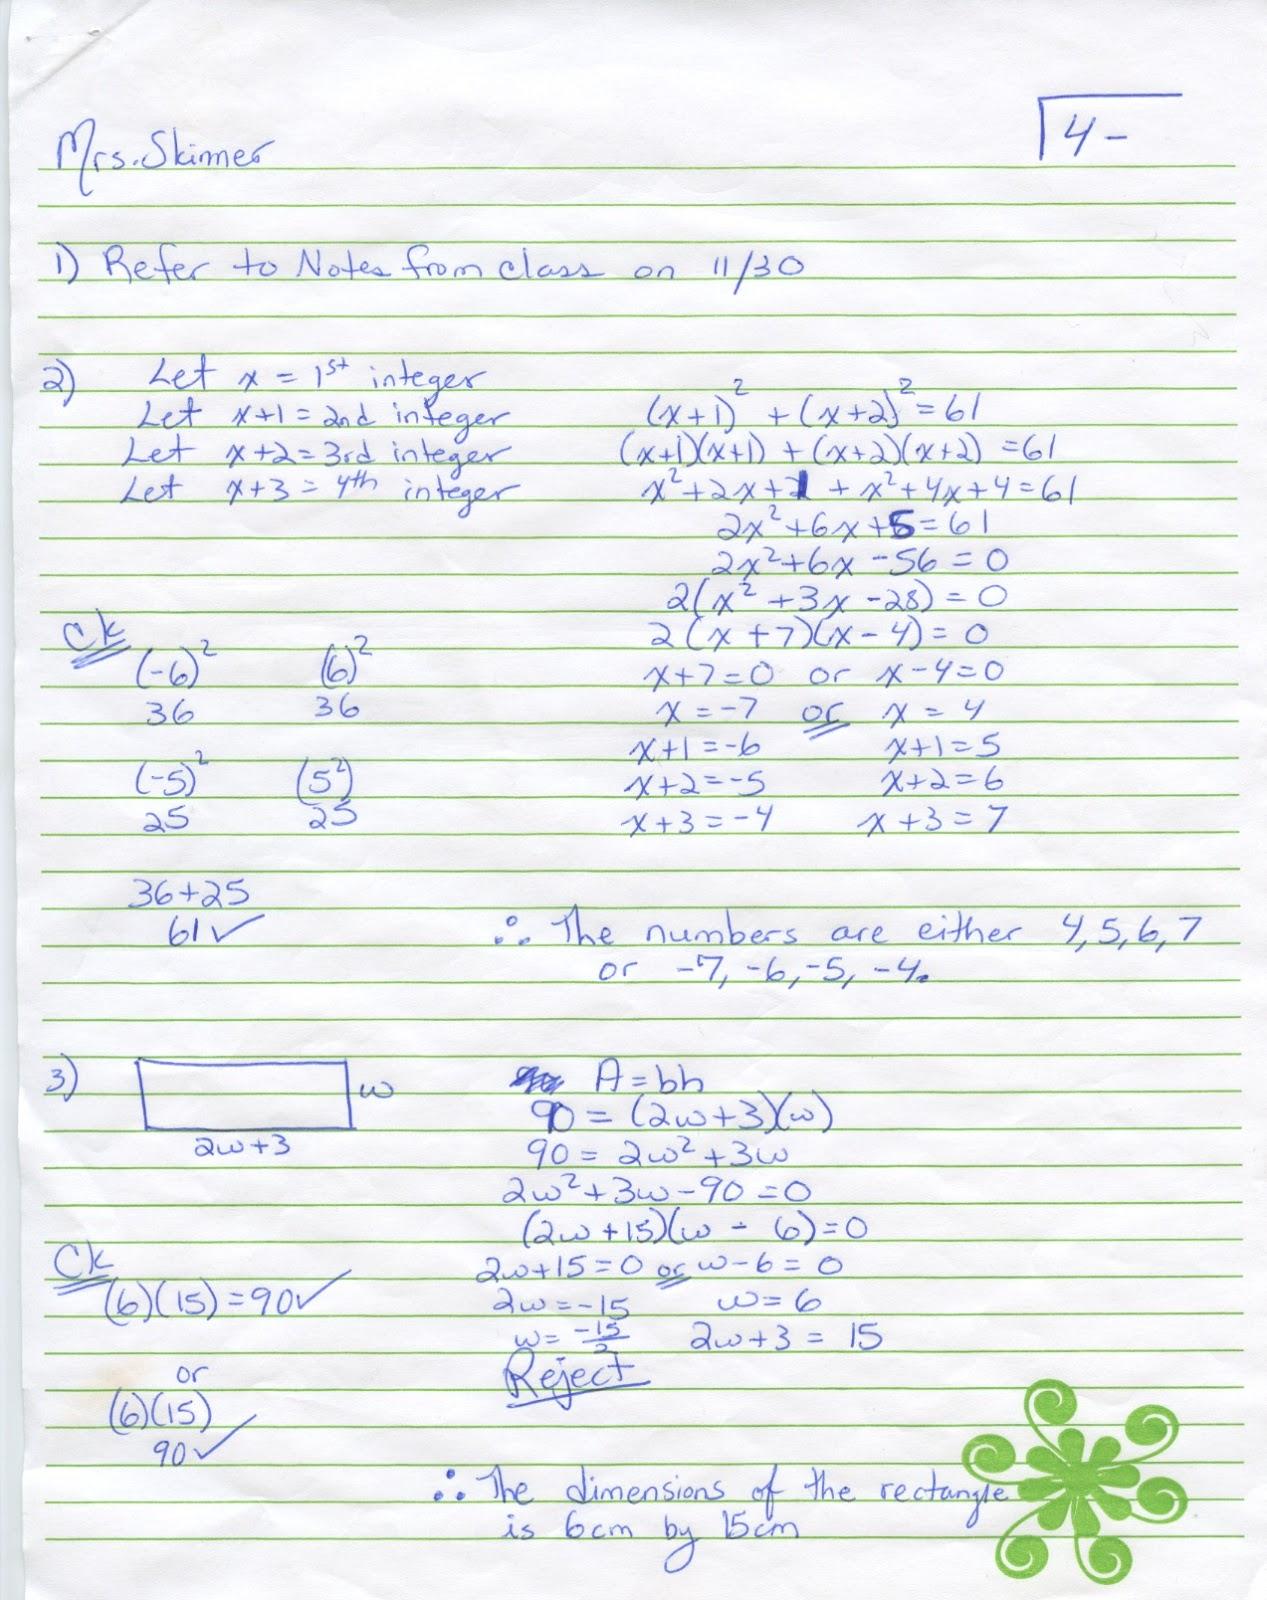 Iroquois Algebra Blog: Unit 4 Word Problems Worksheet Answer Key